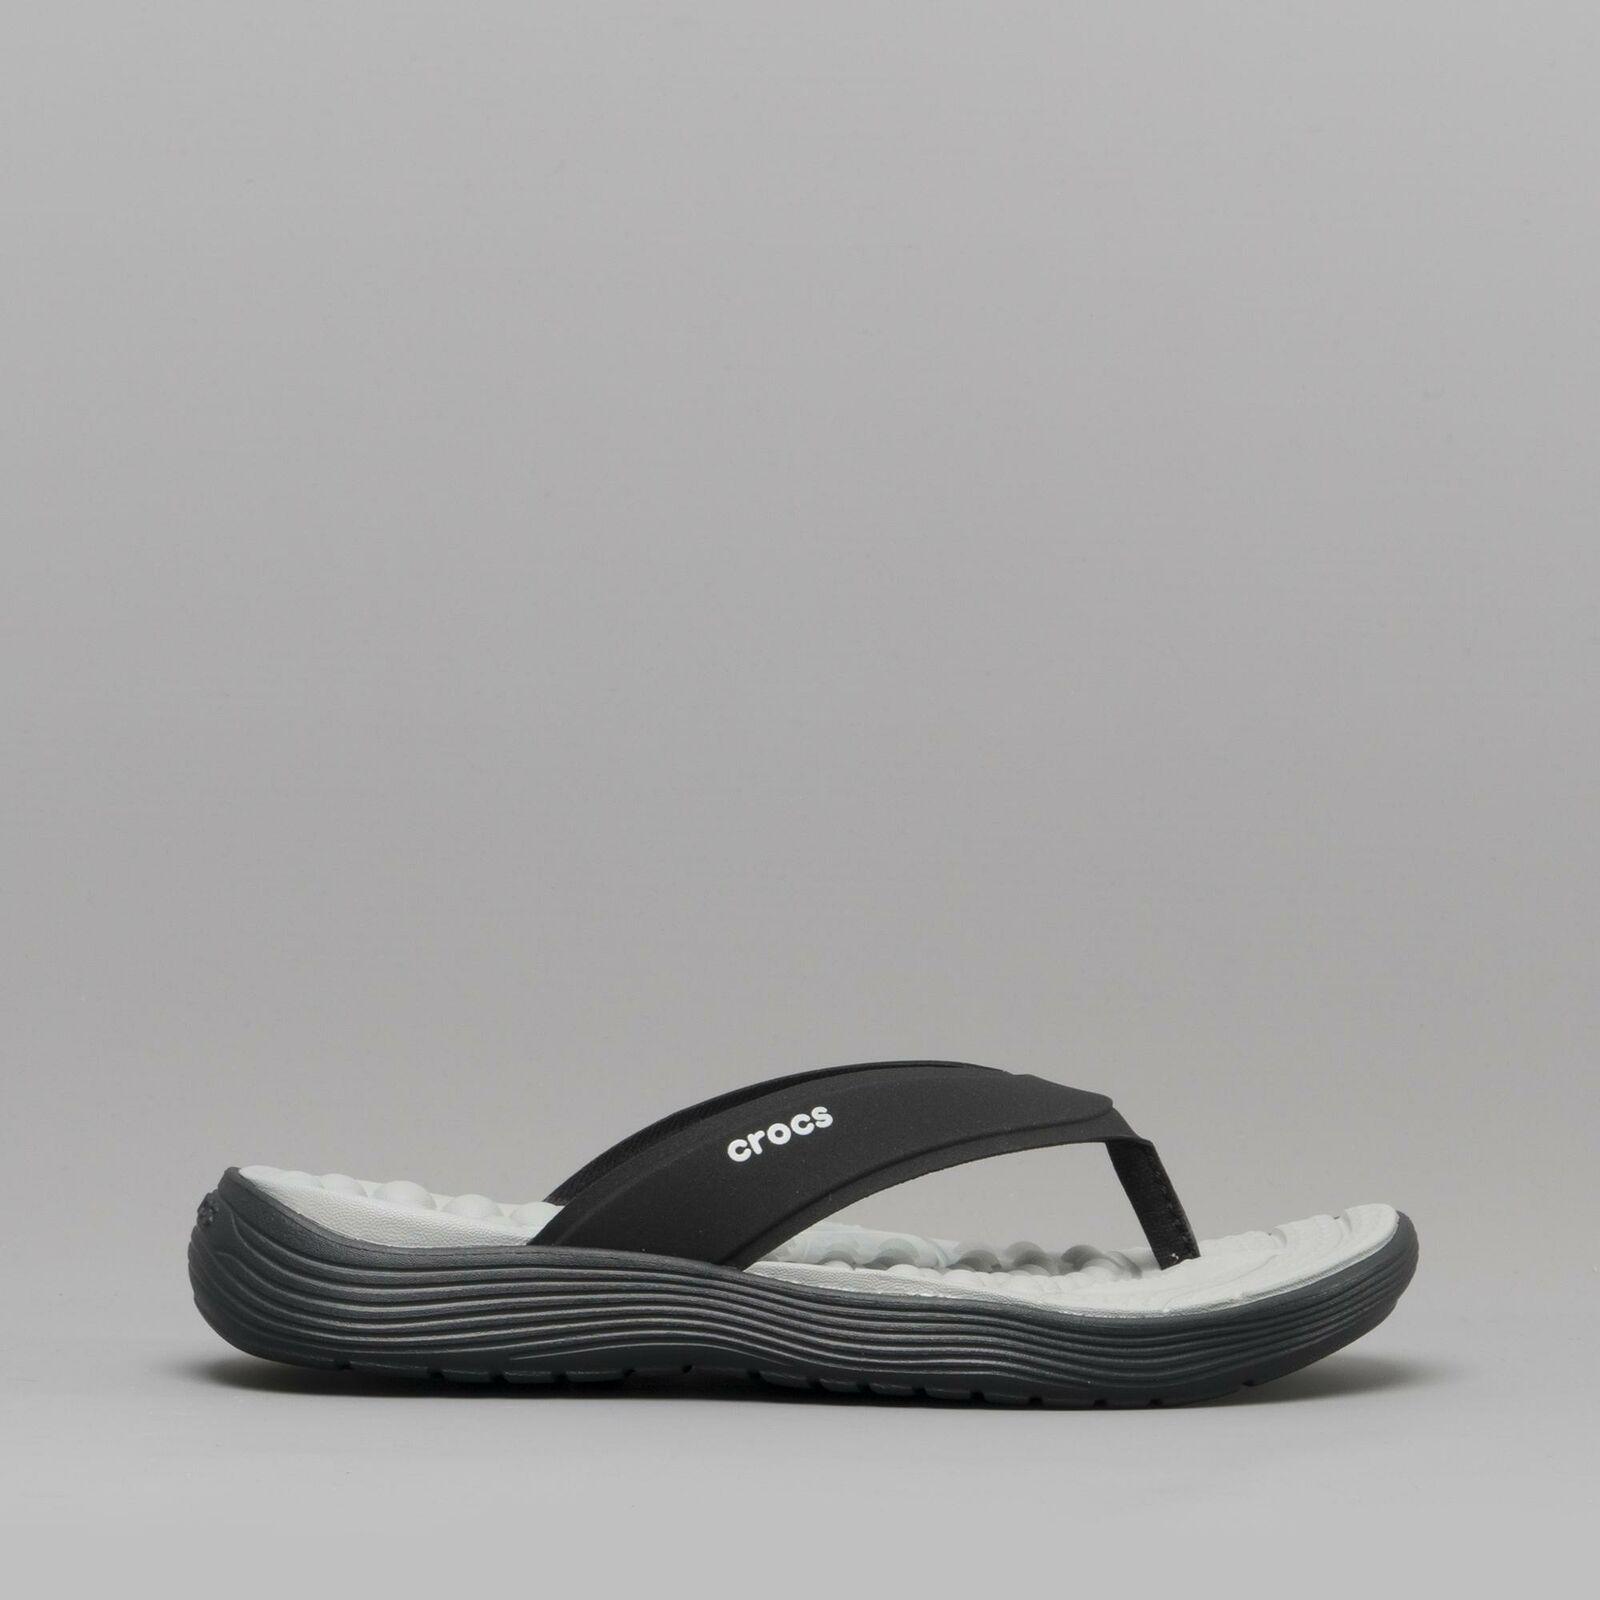 Crocs 205473 REVIVA FLIP Ladies Toe Post Slip On Comfort Pool Flip Flops Black